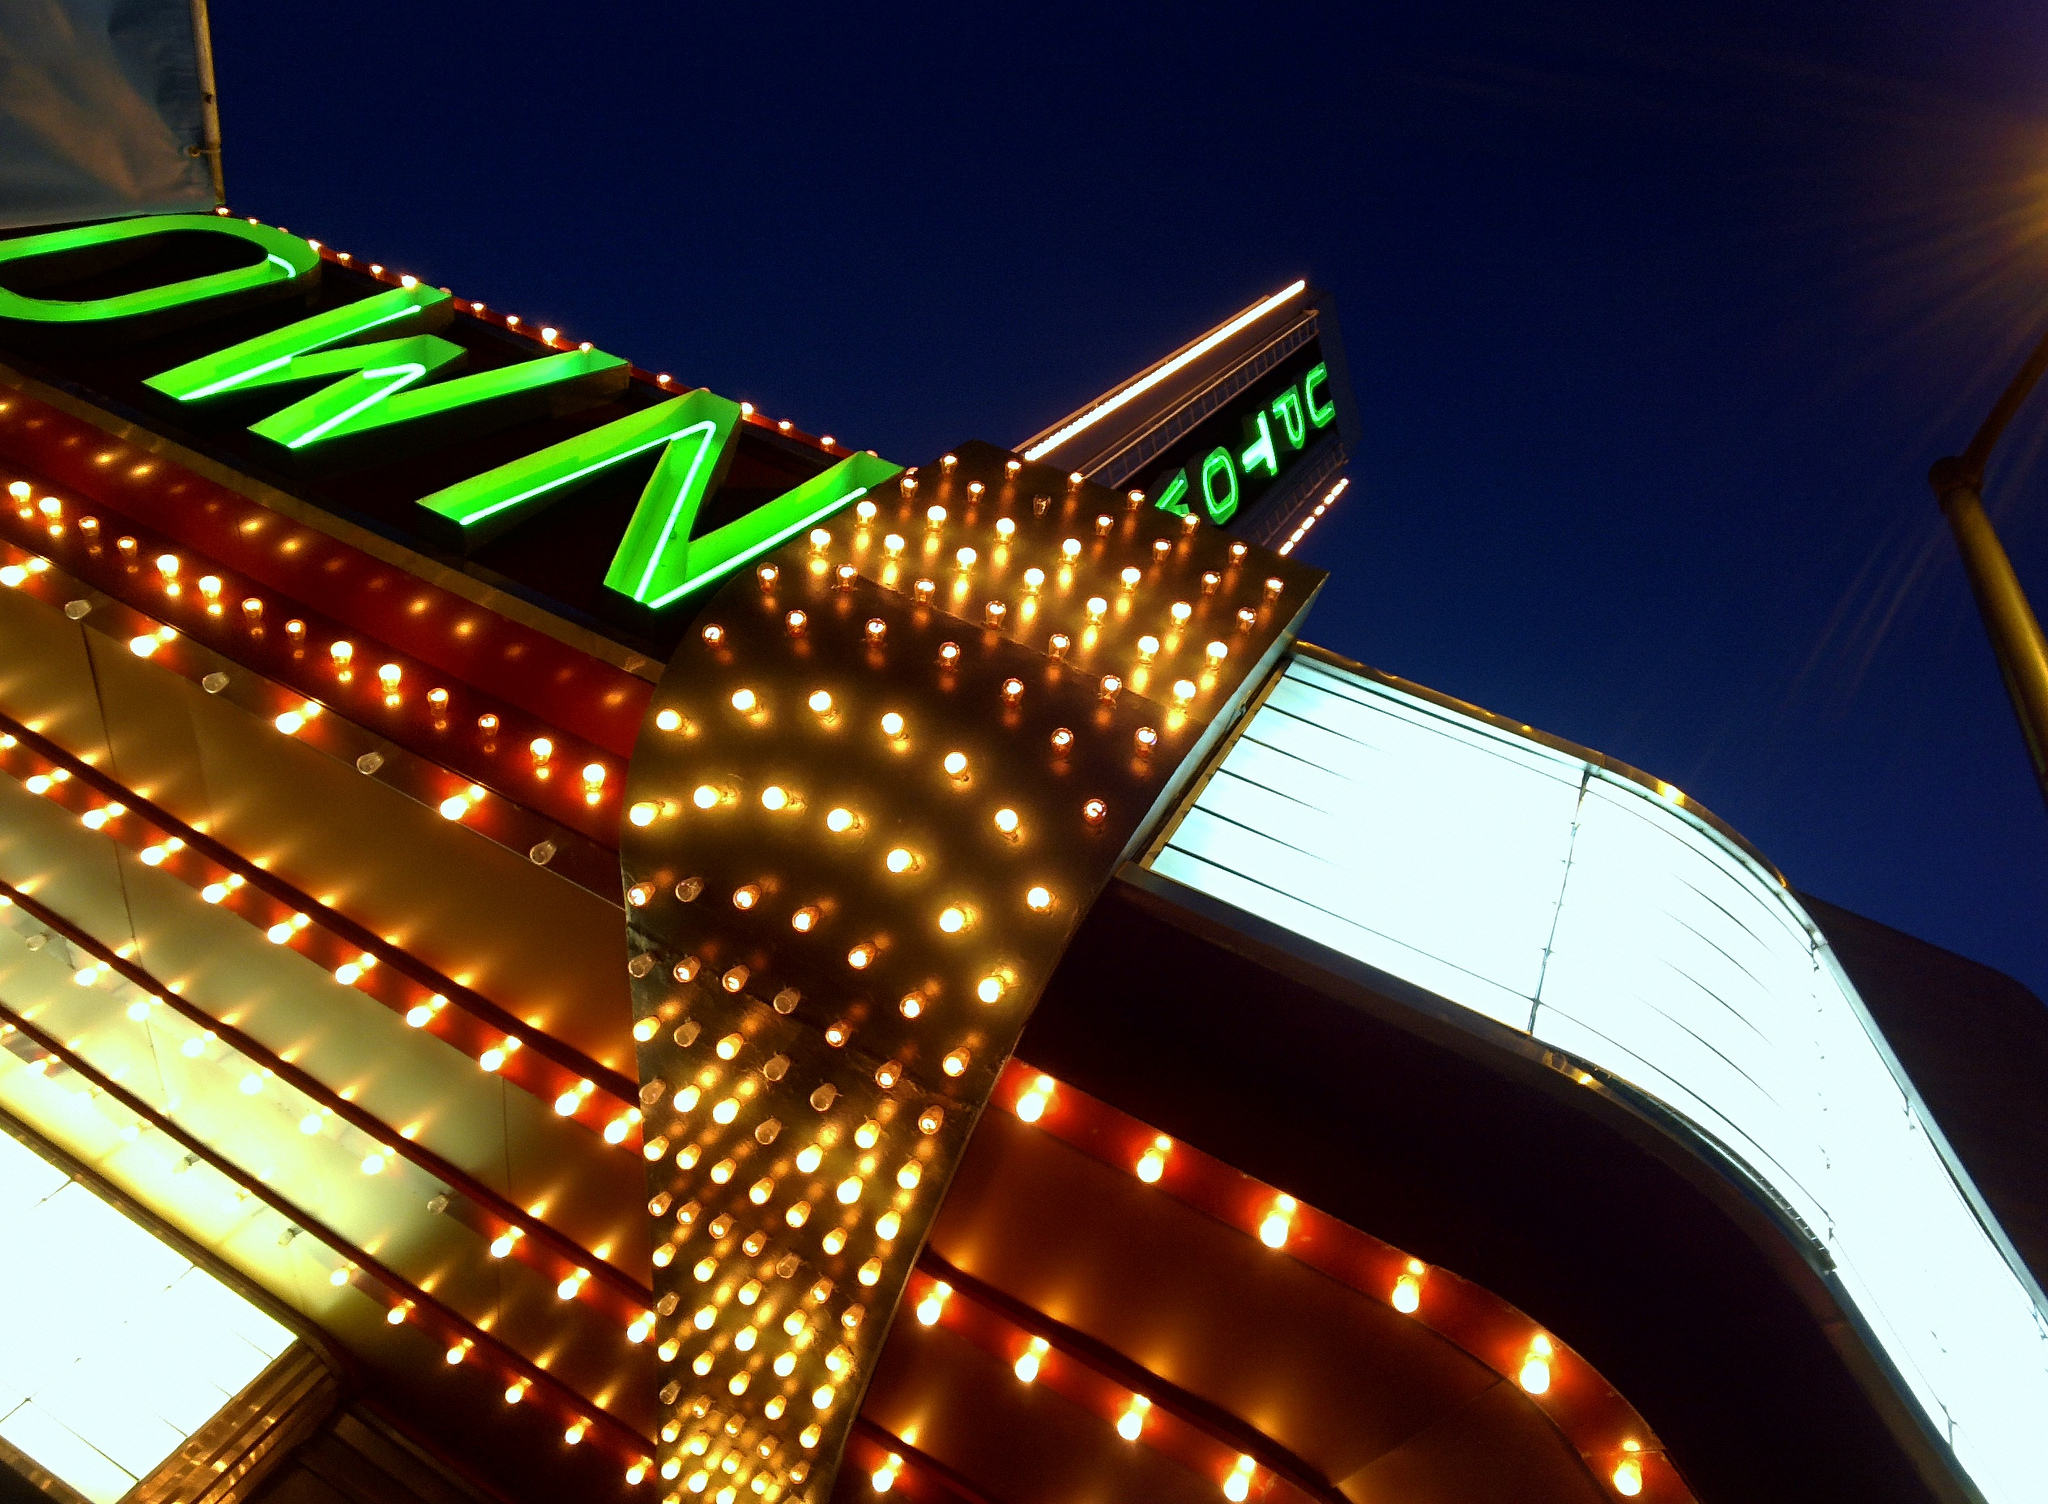 Uptown Theater Neon lights